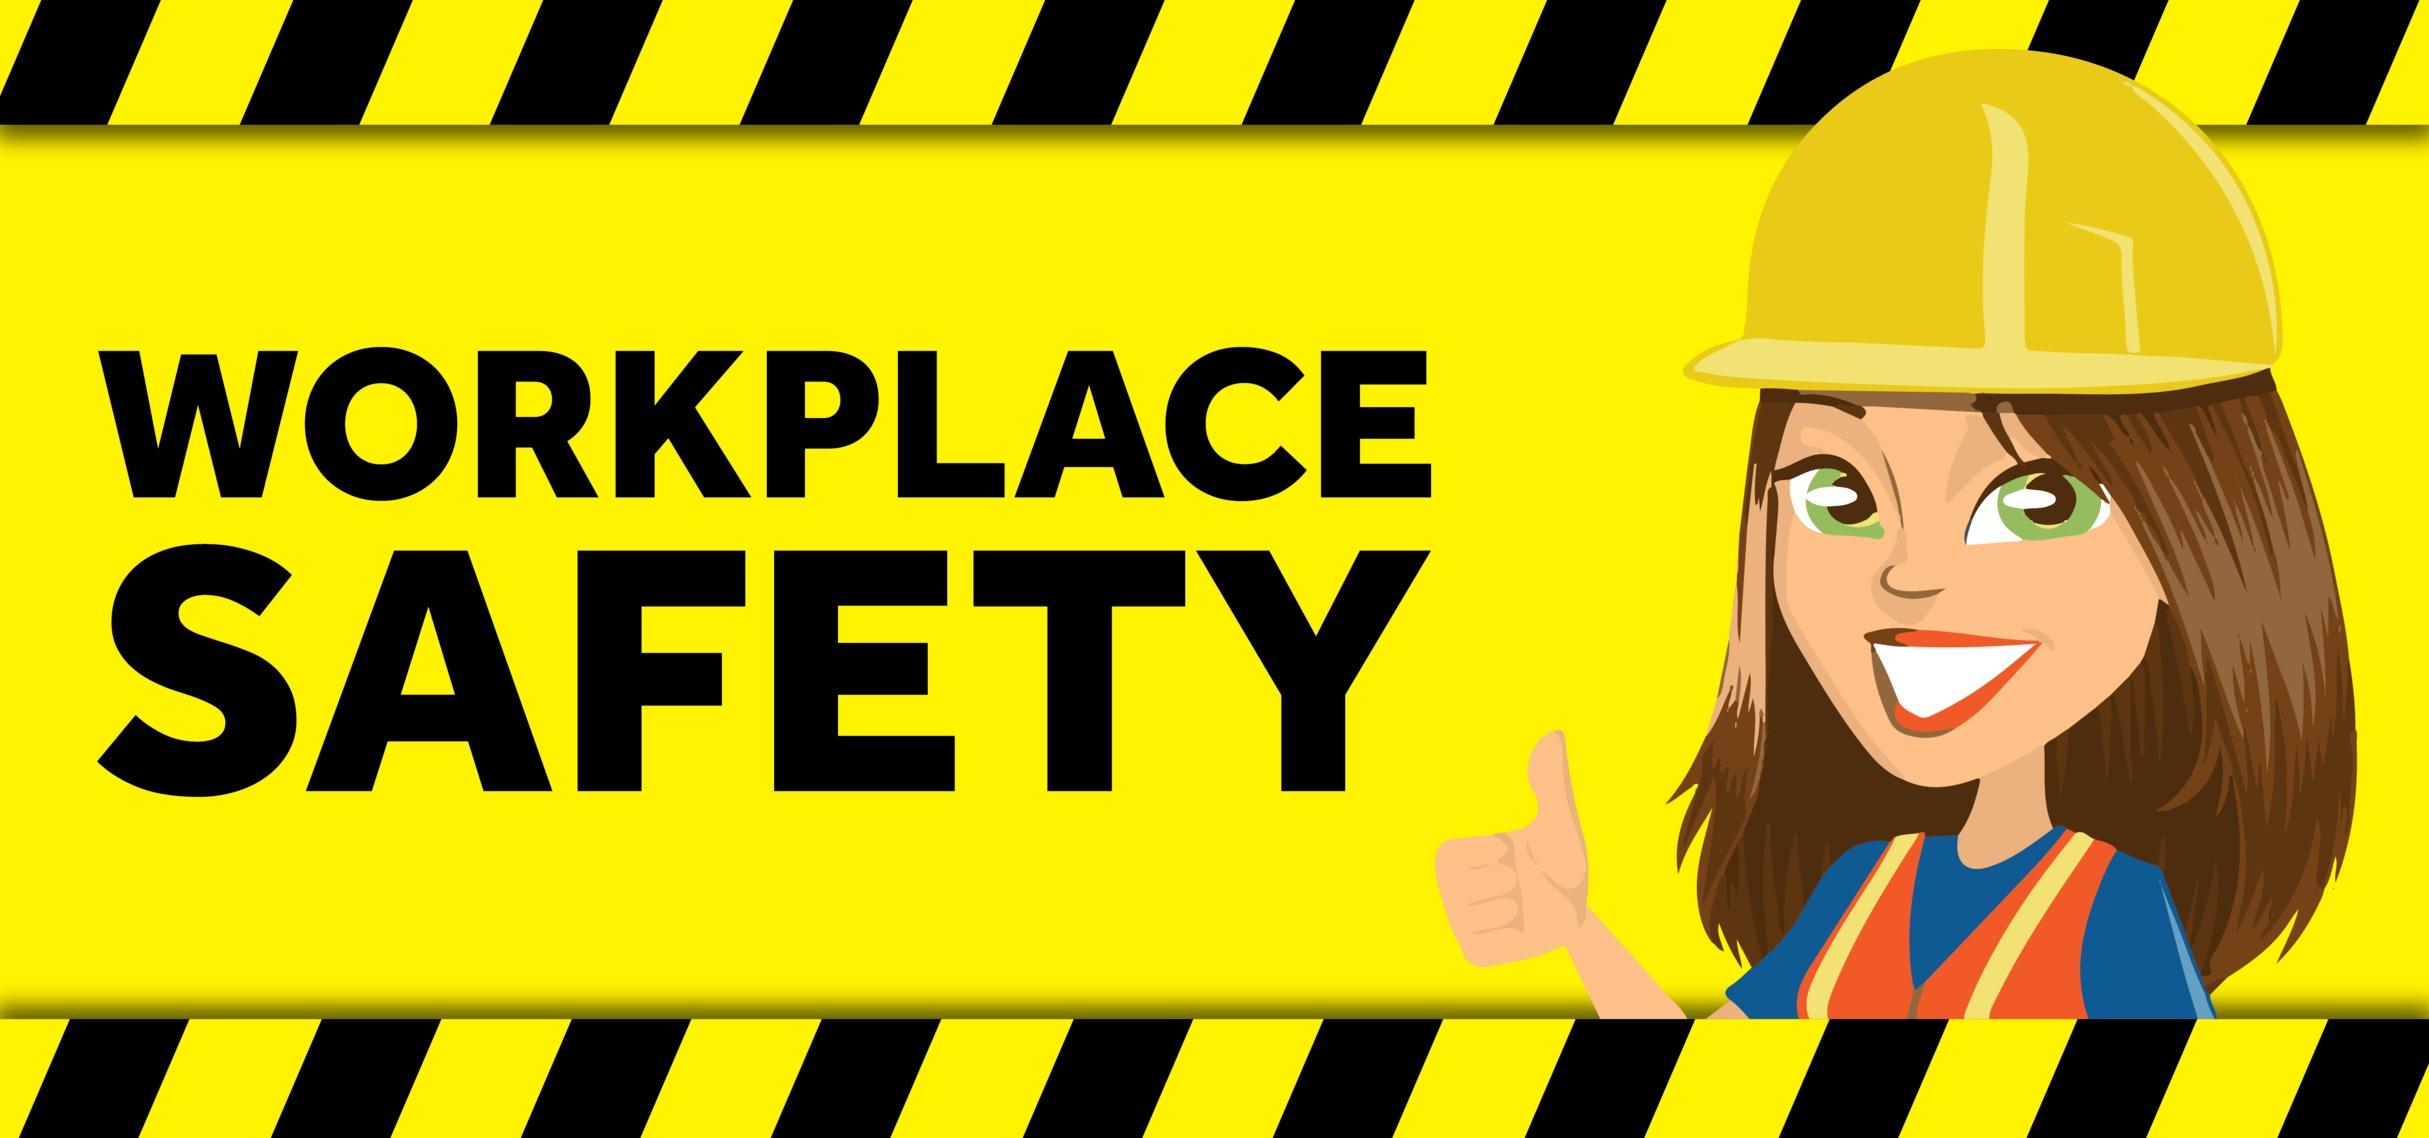 Workplace+Safety.jpg